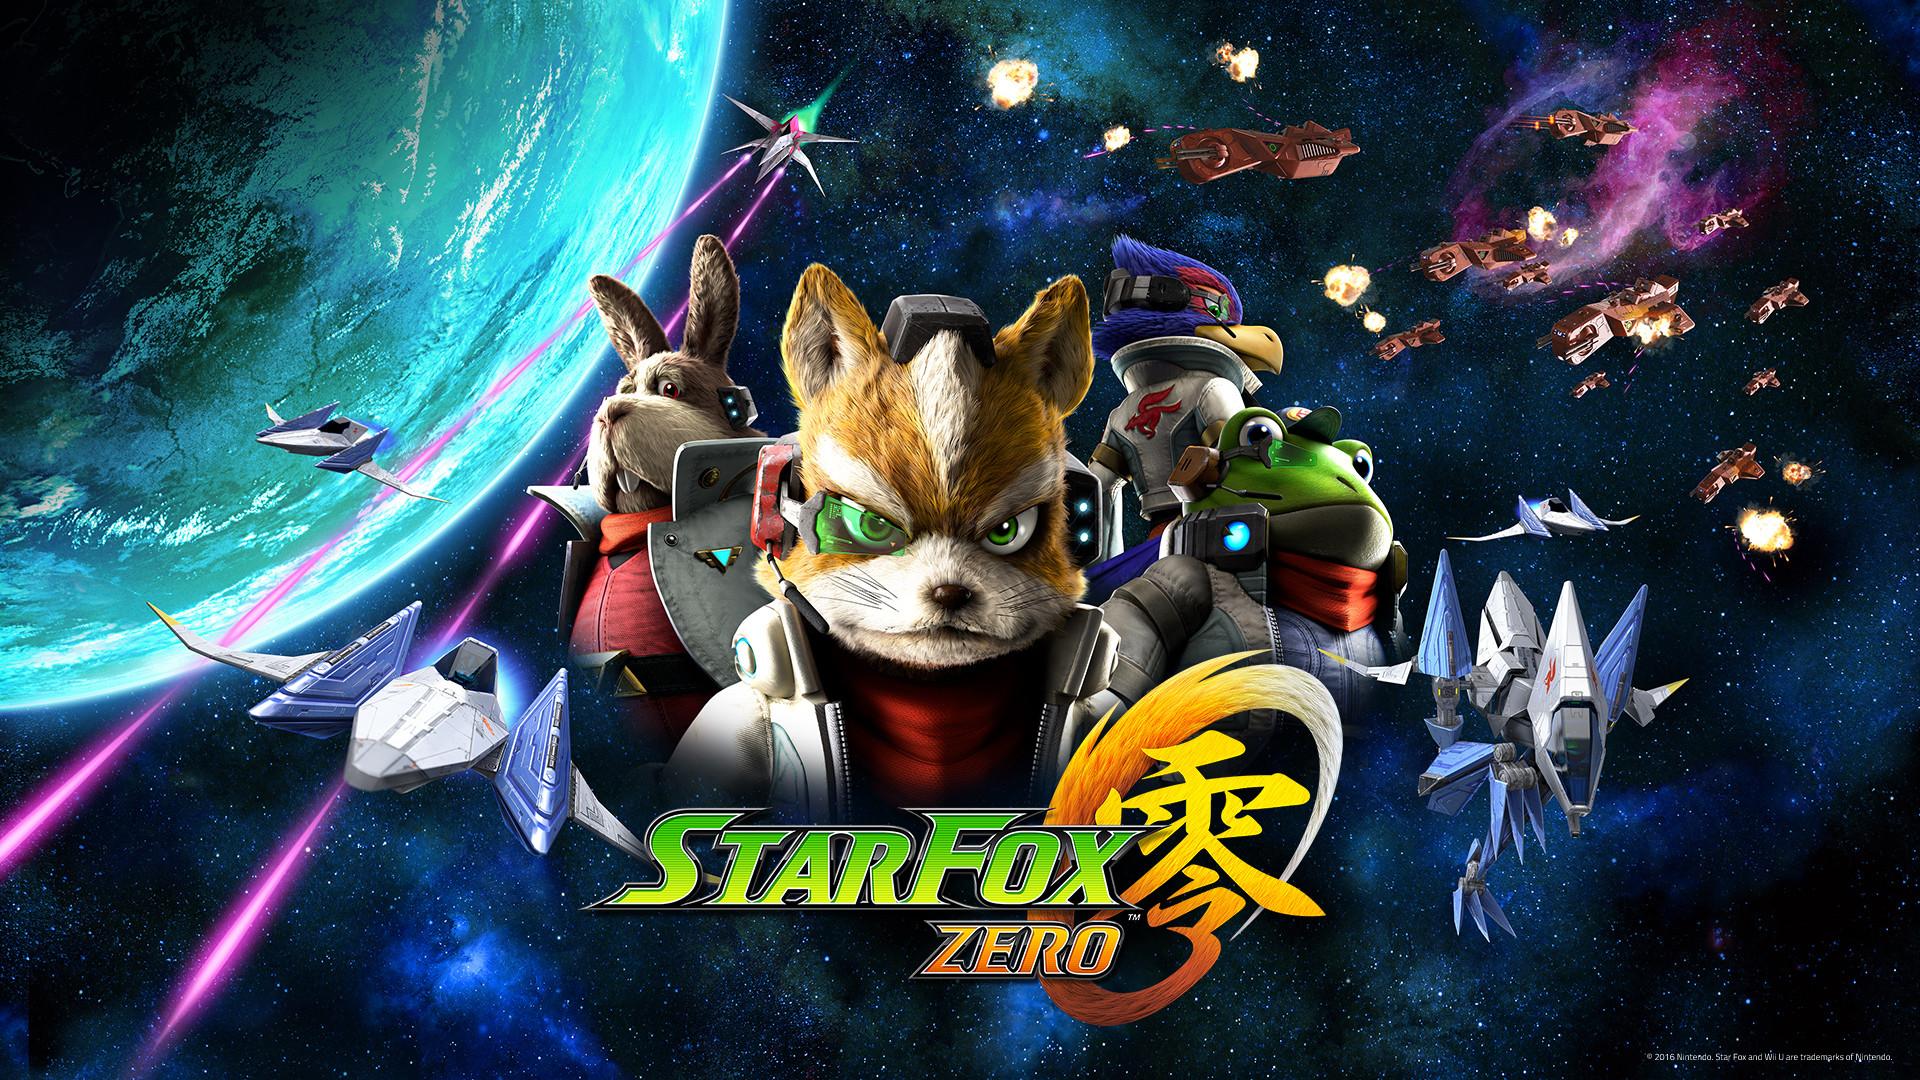 Wallpapers. Star Fox Zero Vehicles Wallpaper